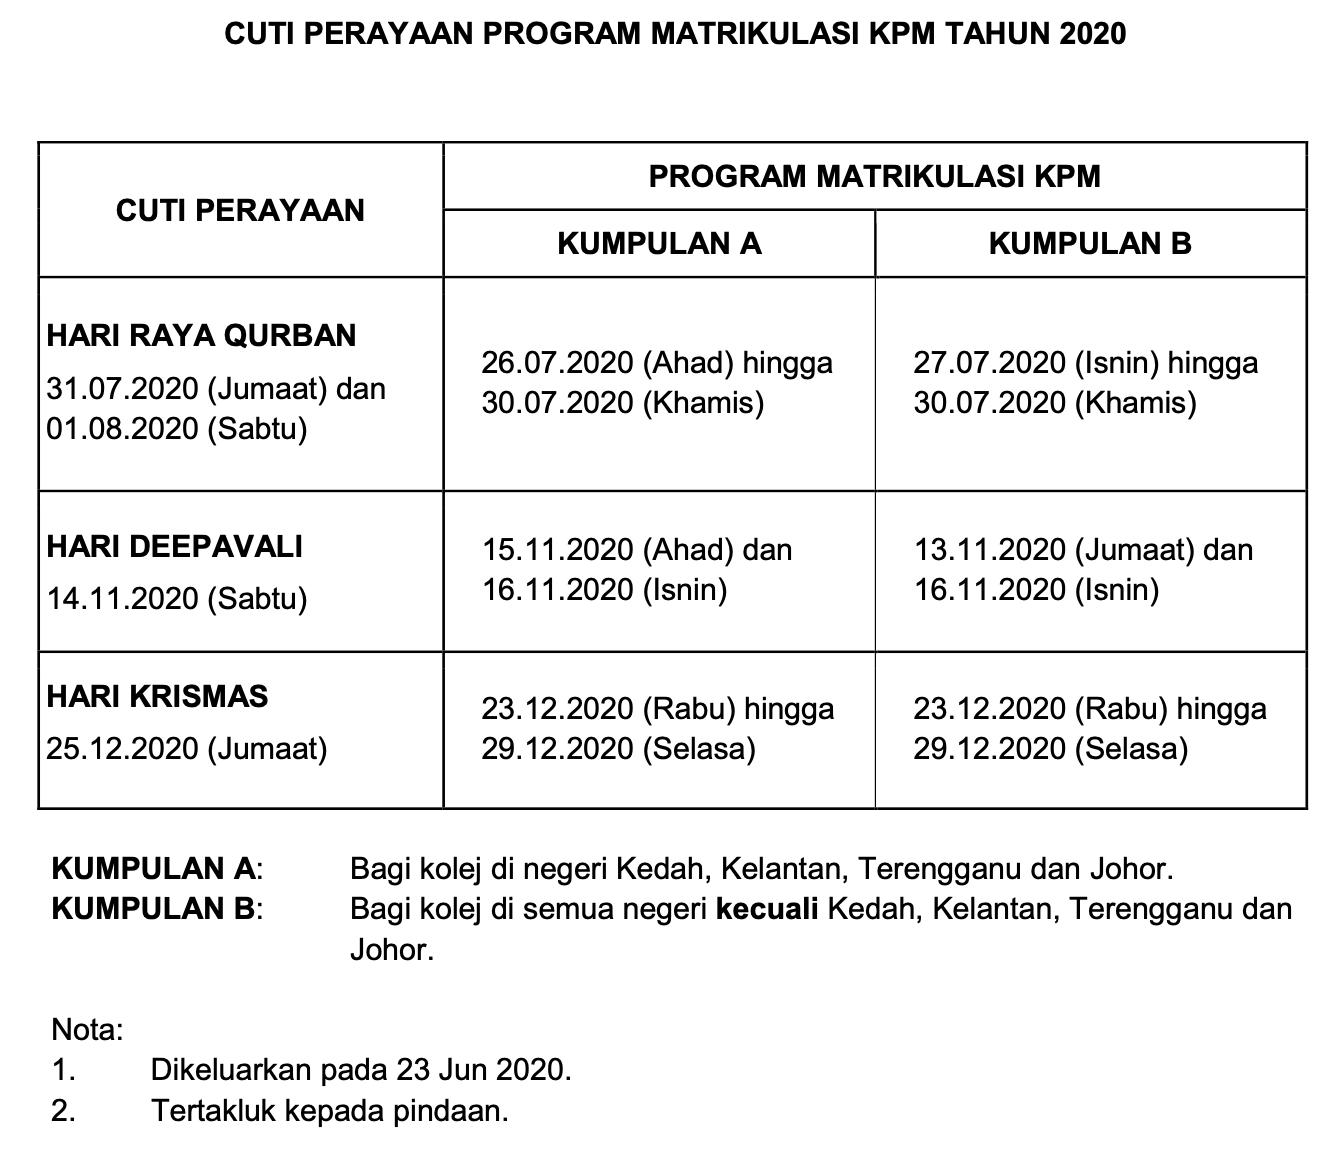 kalender akademik 2020/2021